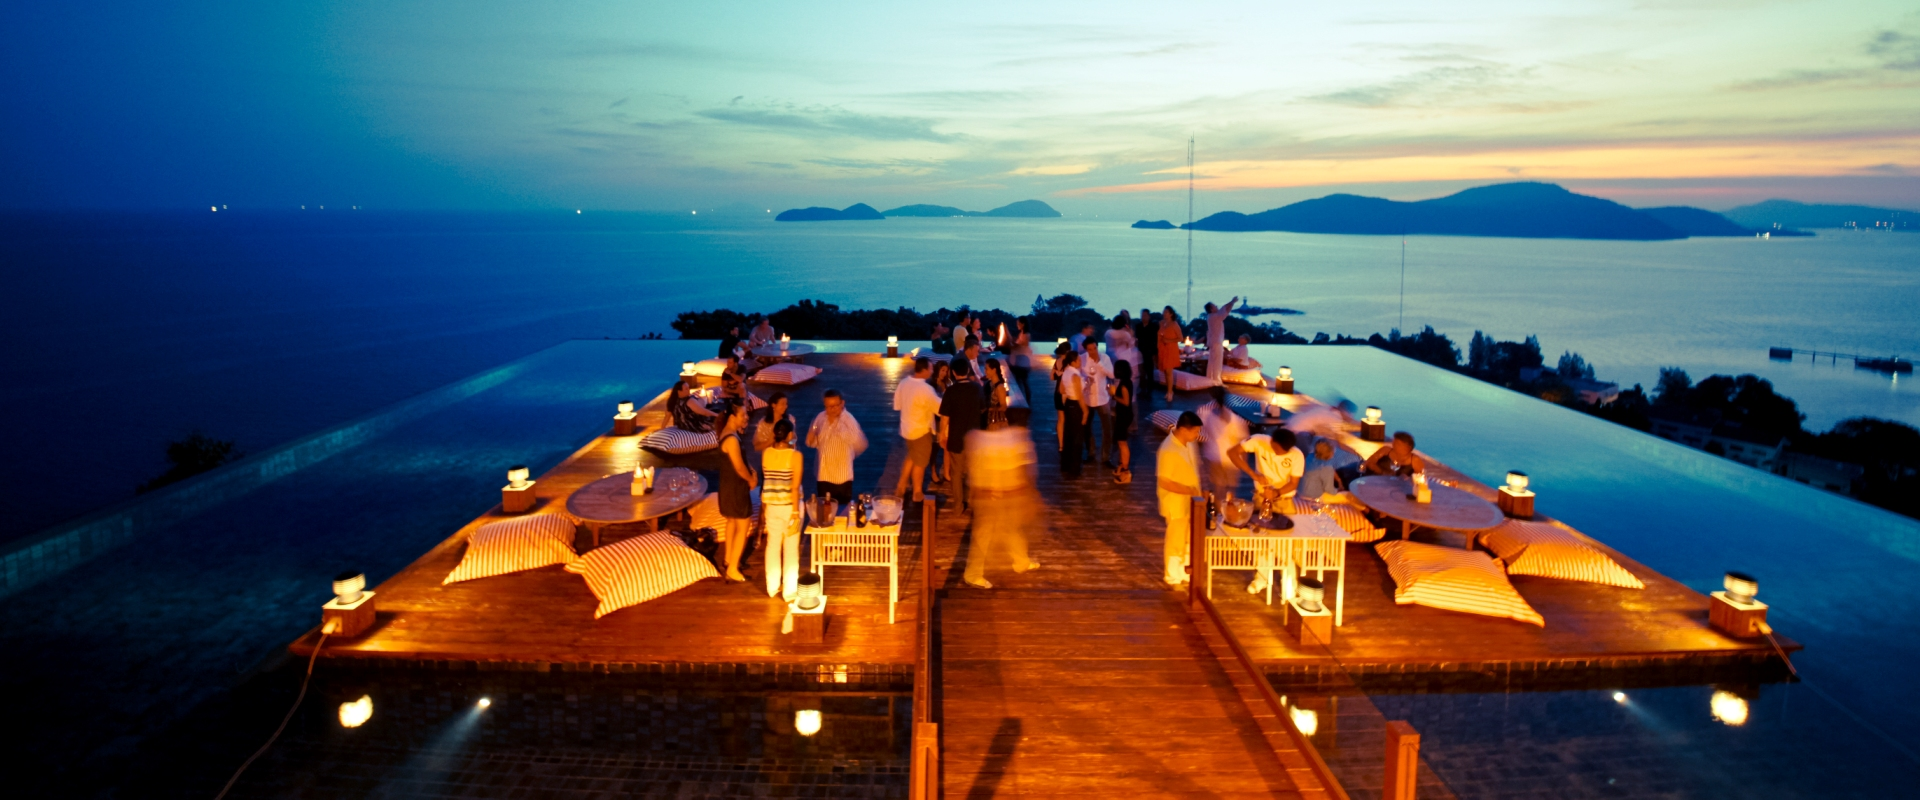 phuket-bars